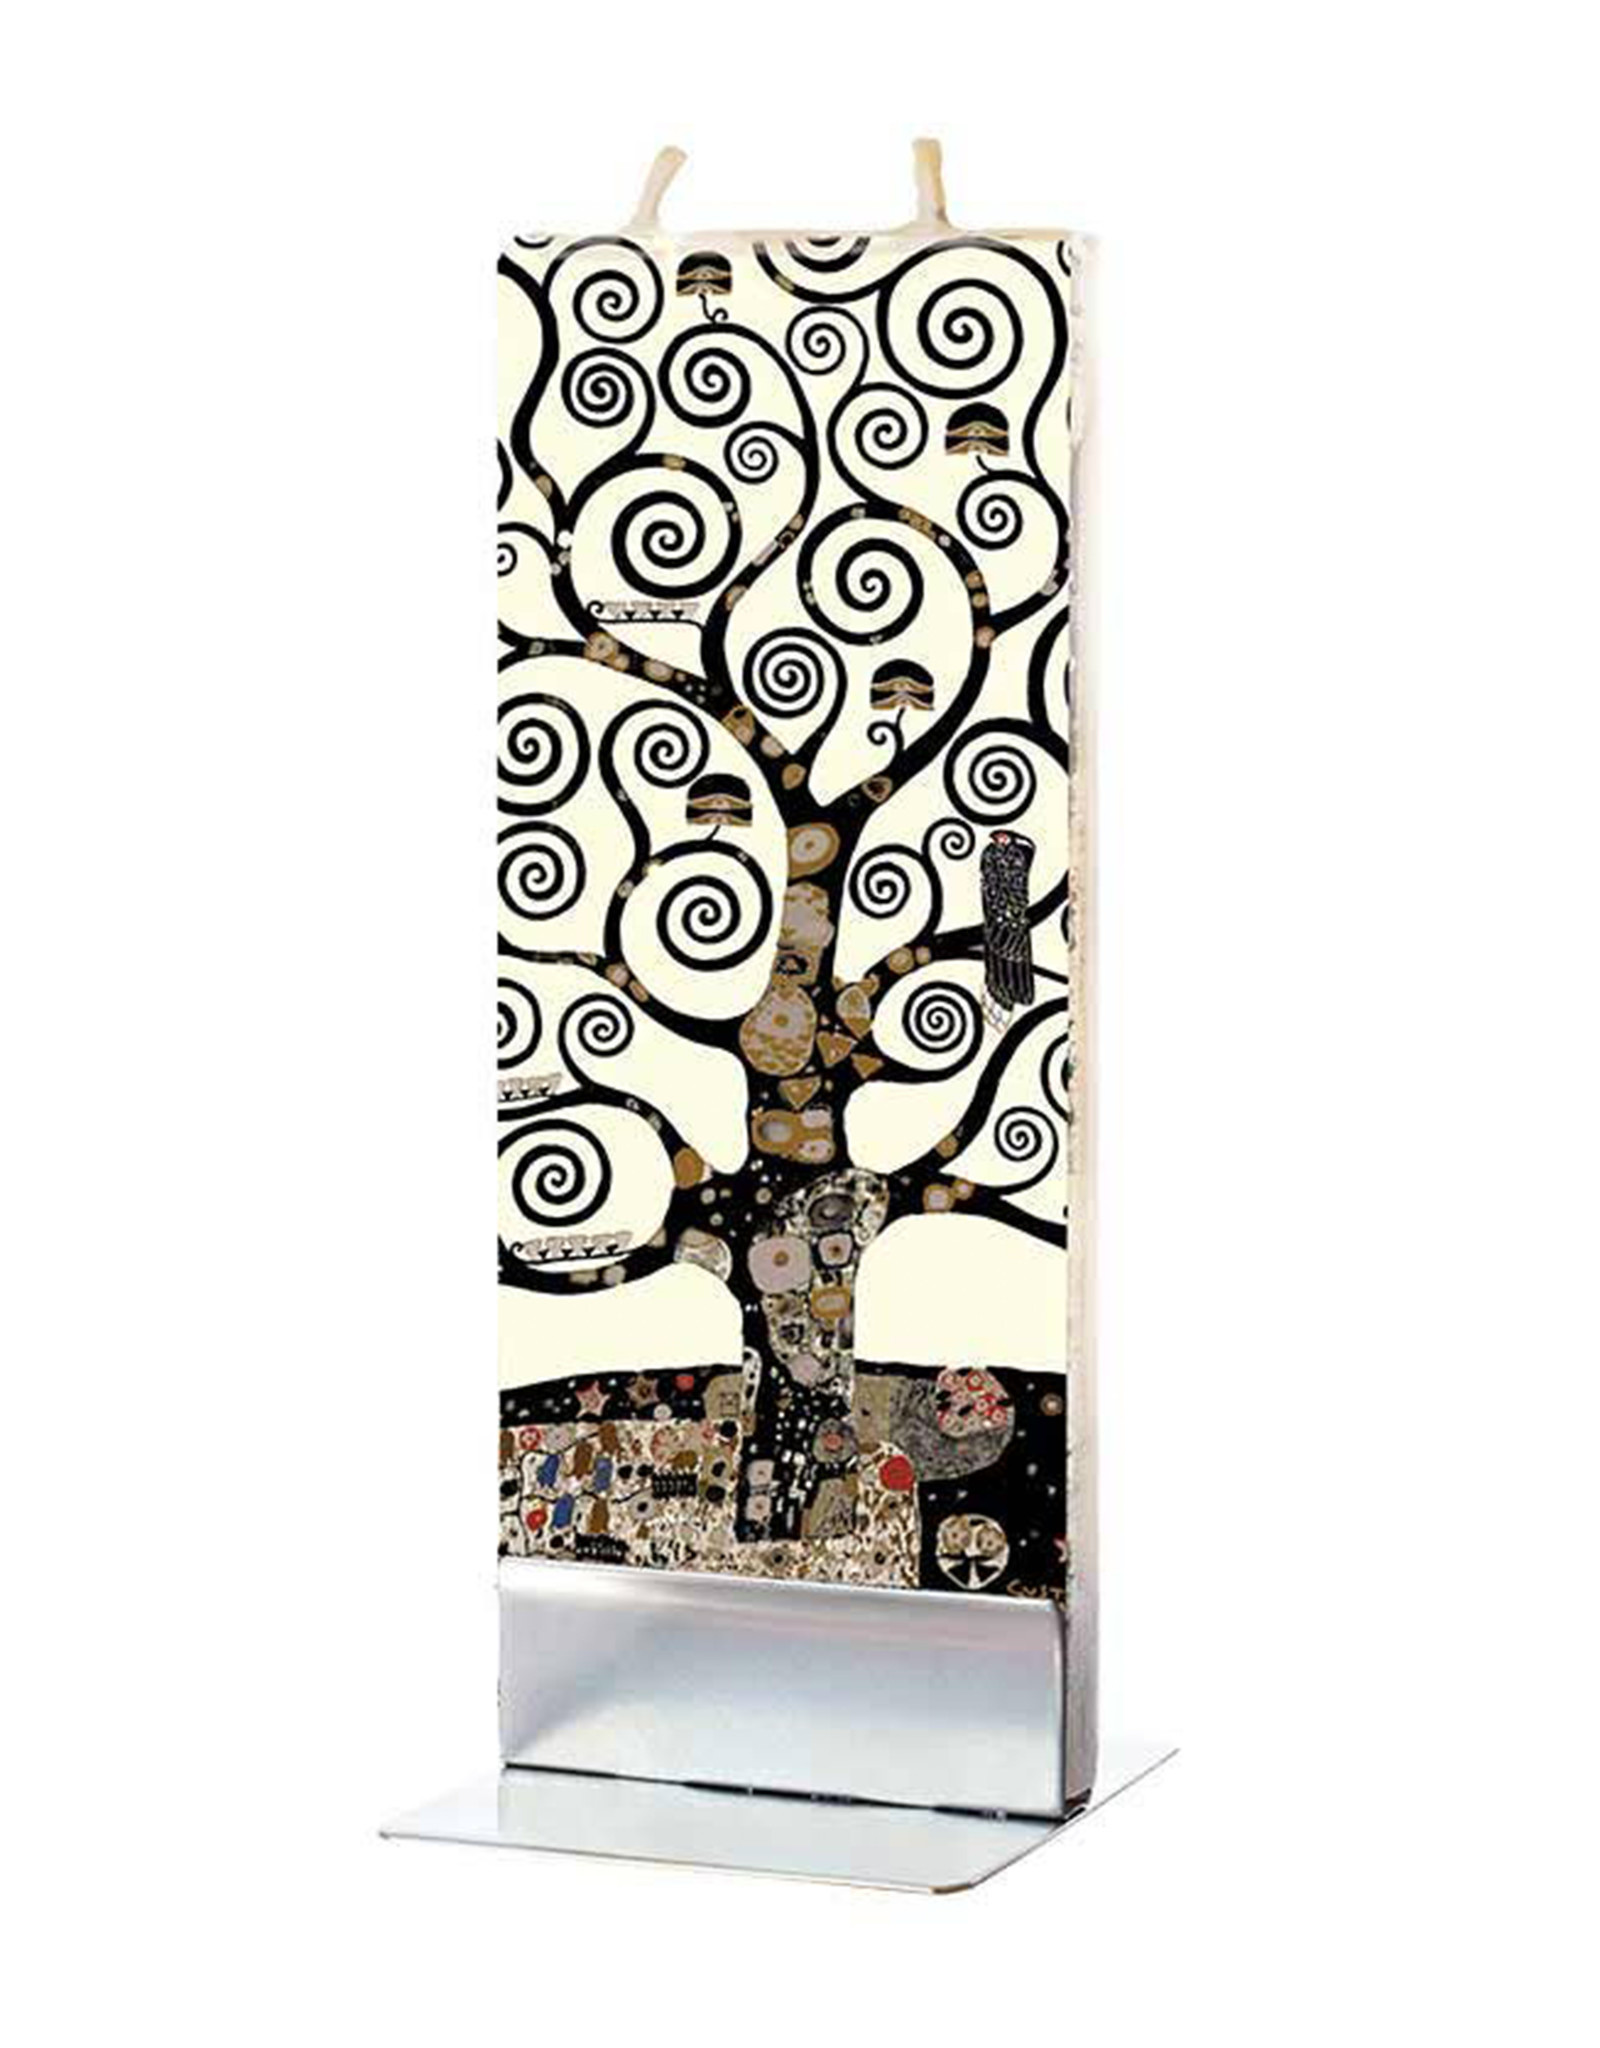 FLATYZ KLIMT TREE OF LIFE CANDLE